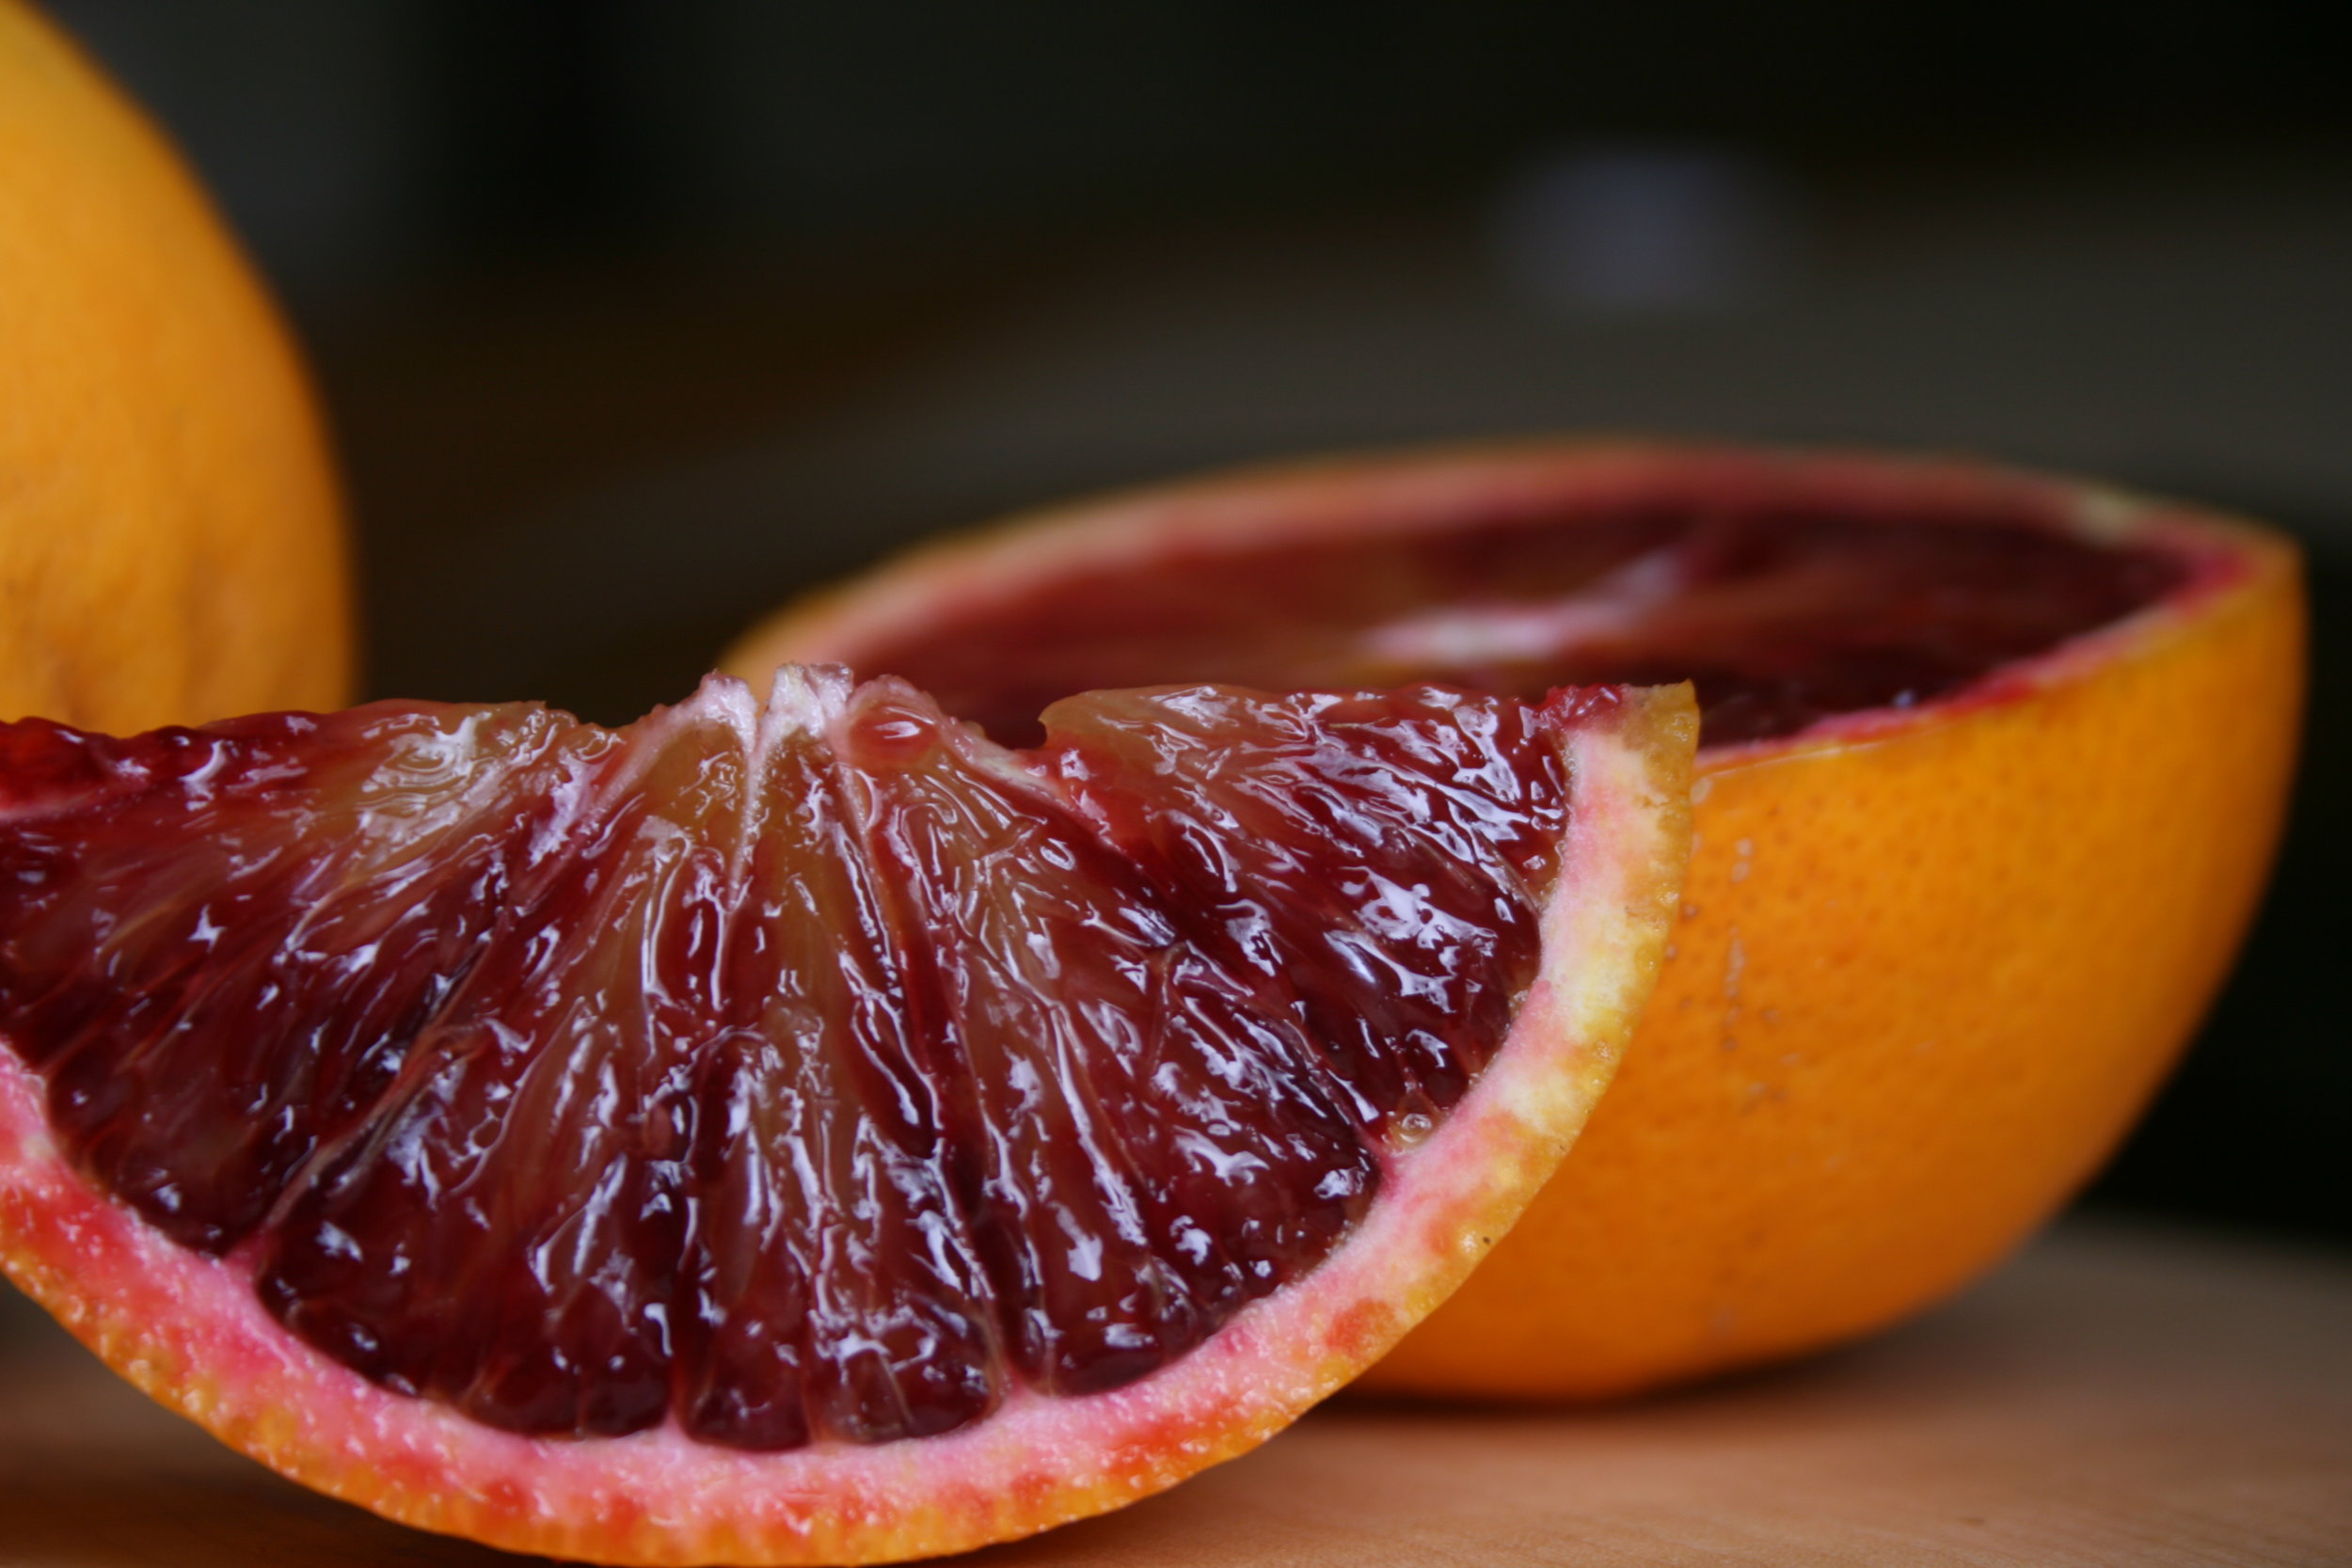 blood orange slice.JPG